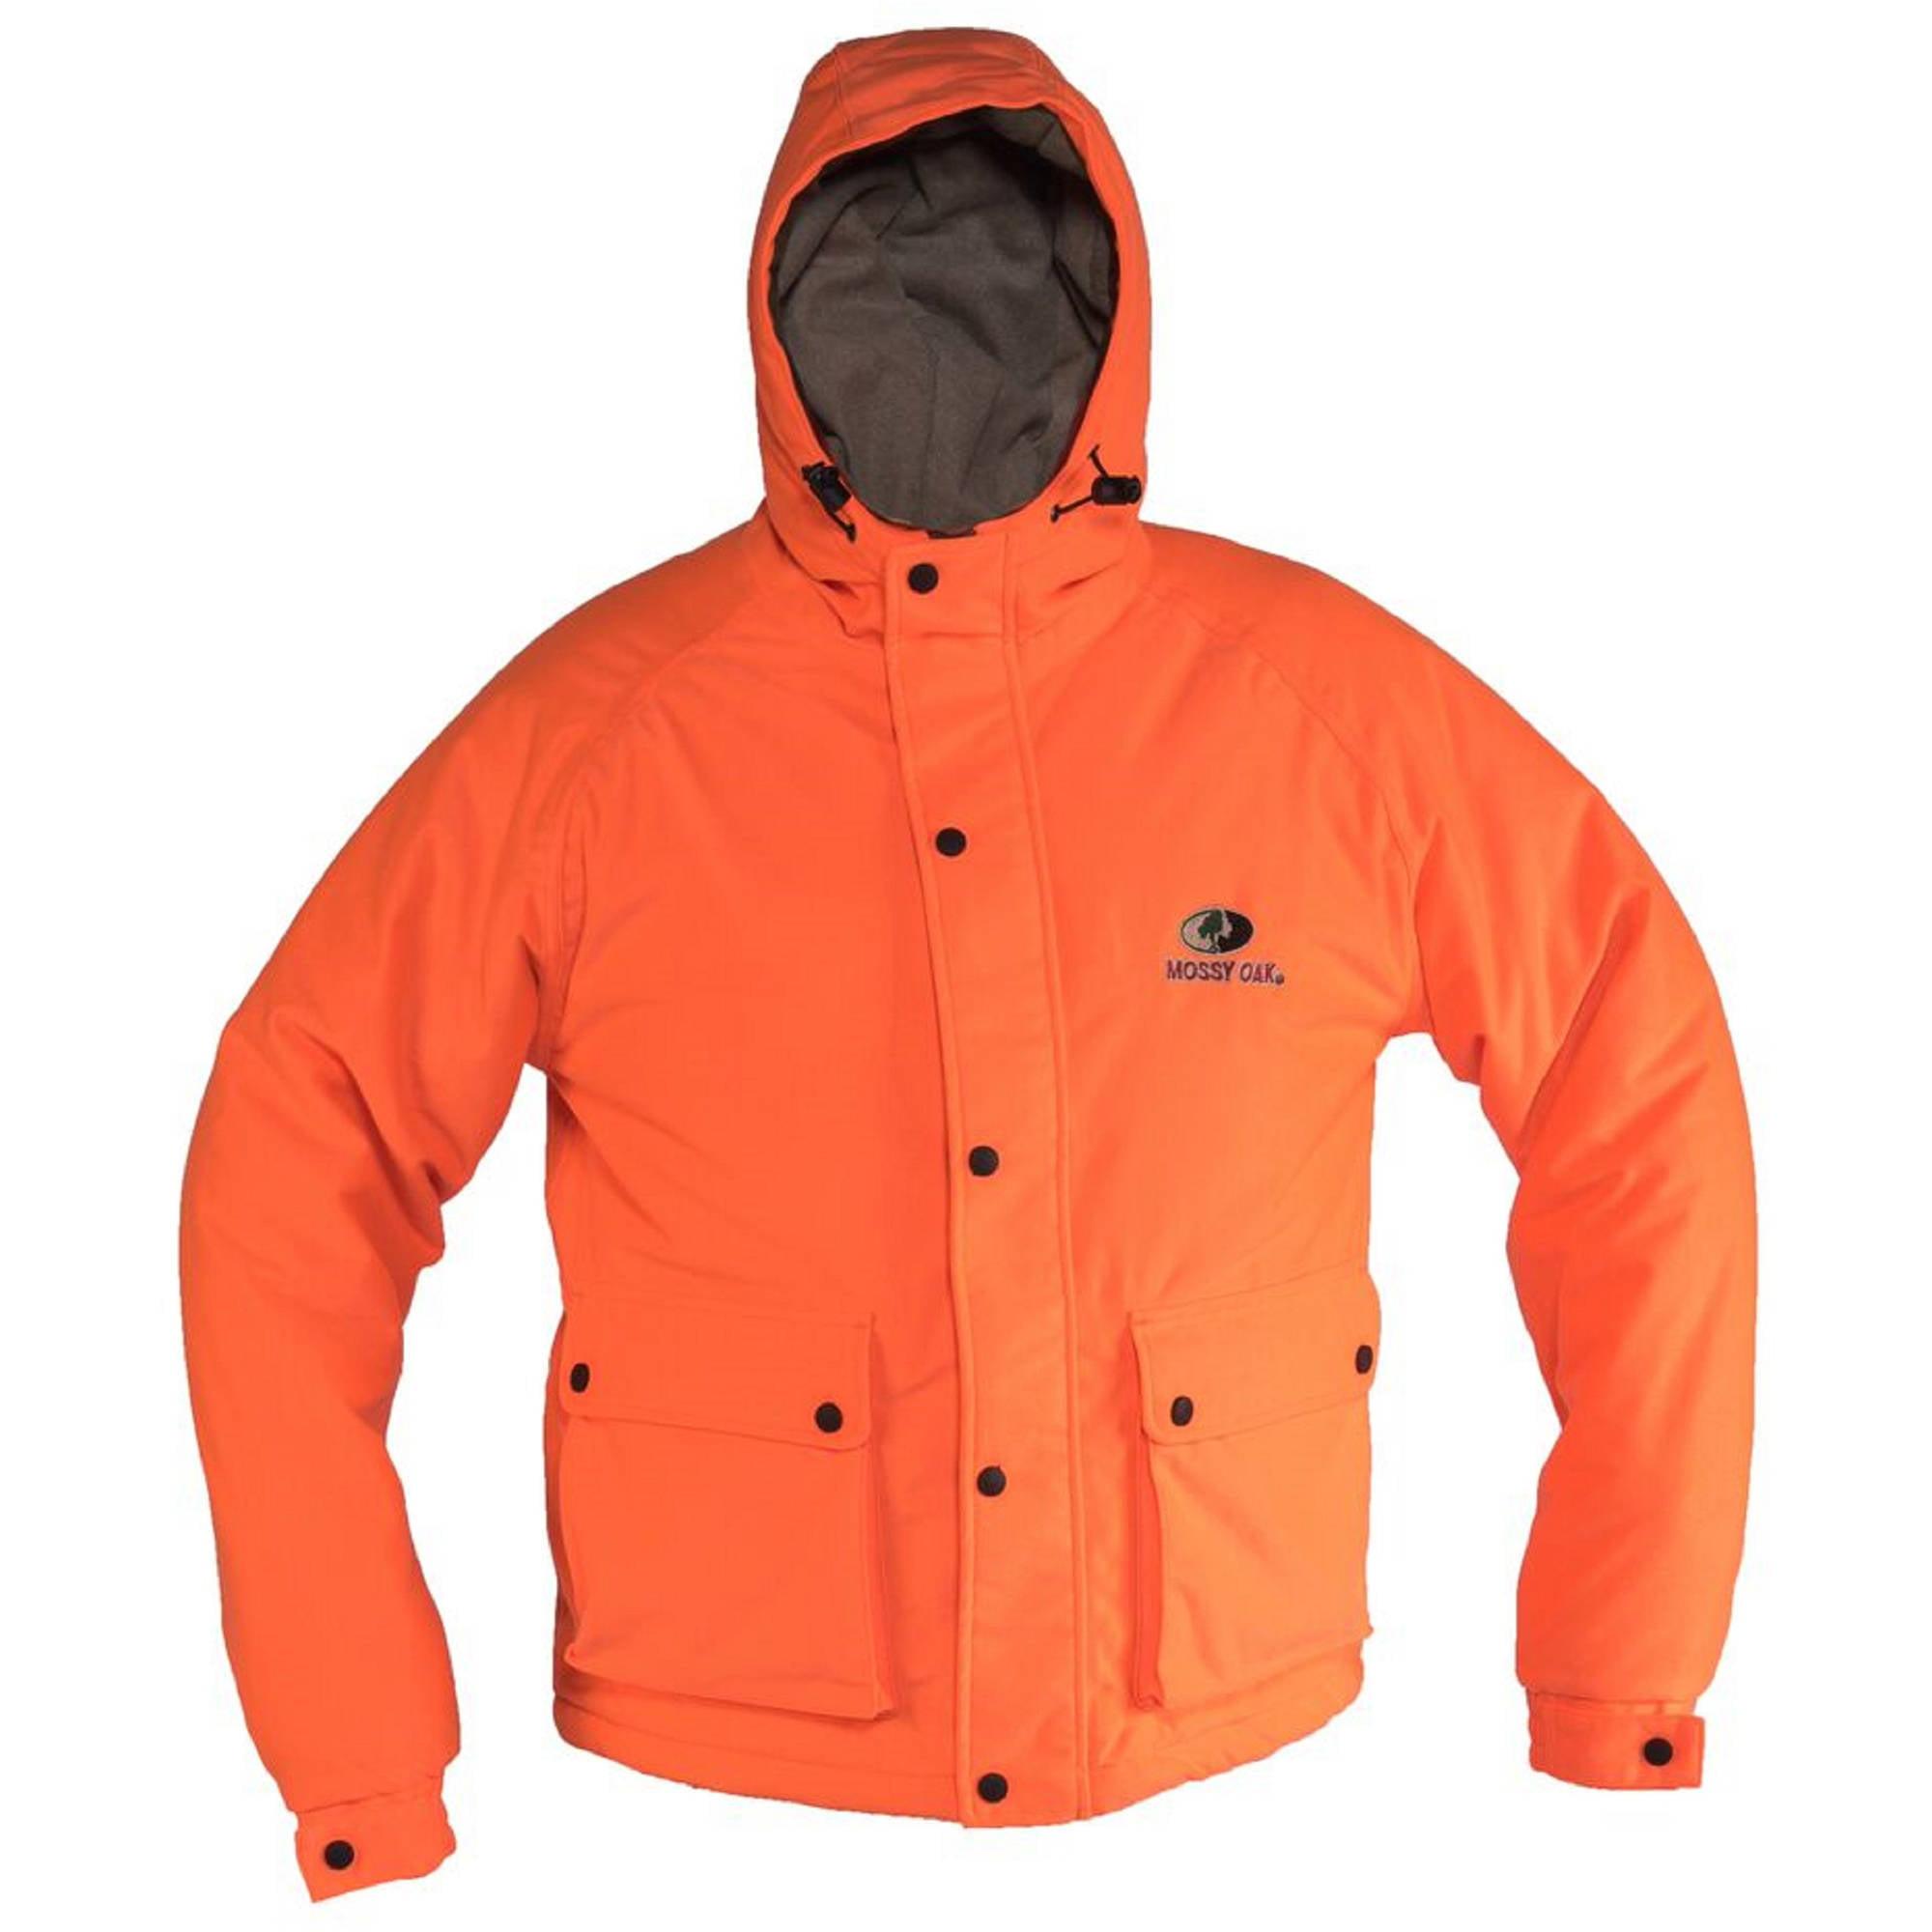 Men\'s Insulated Jacket, Blaze Orange - Walmart.com